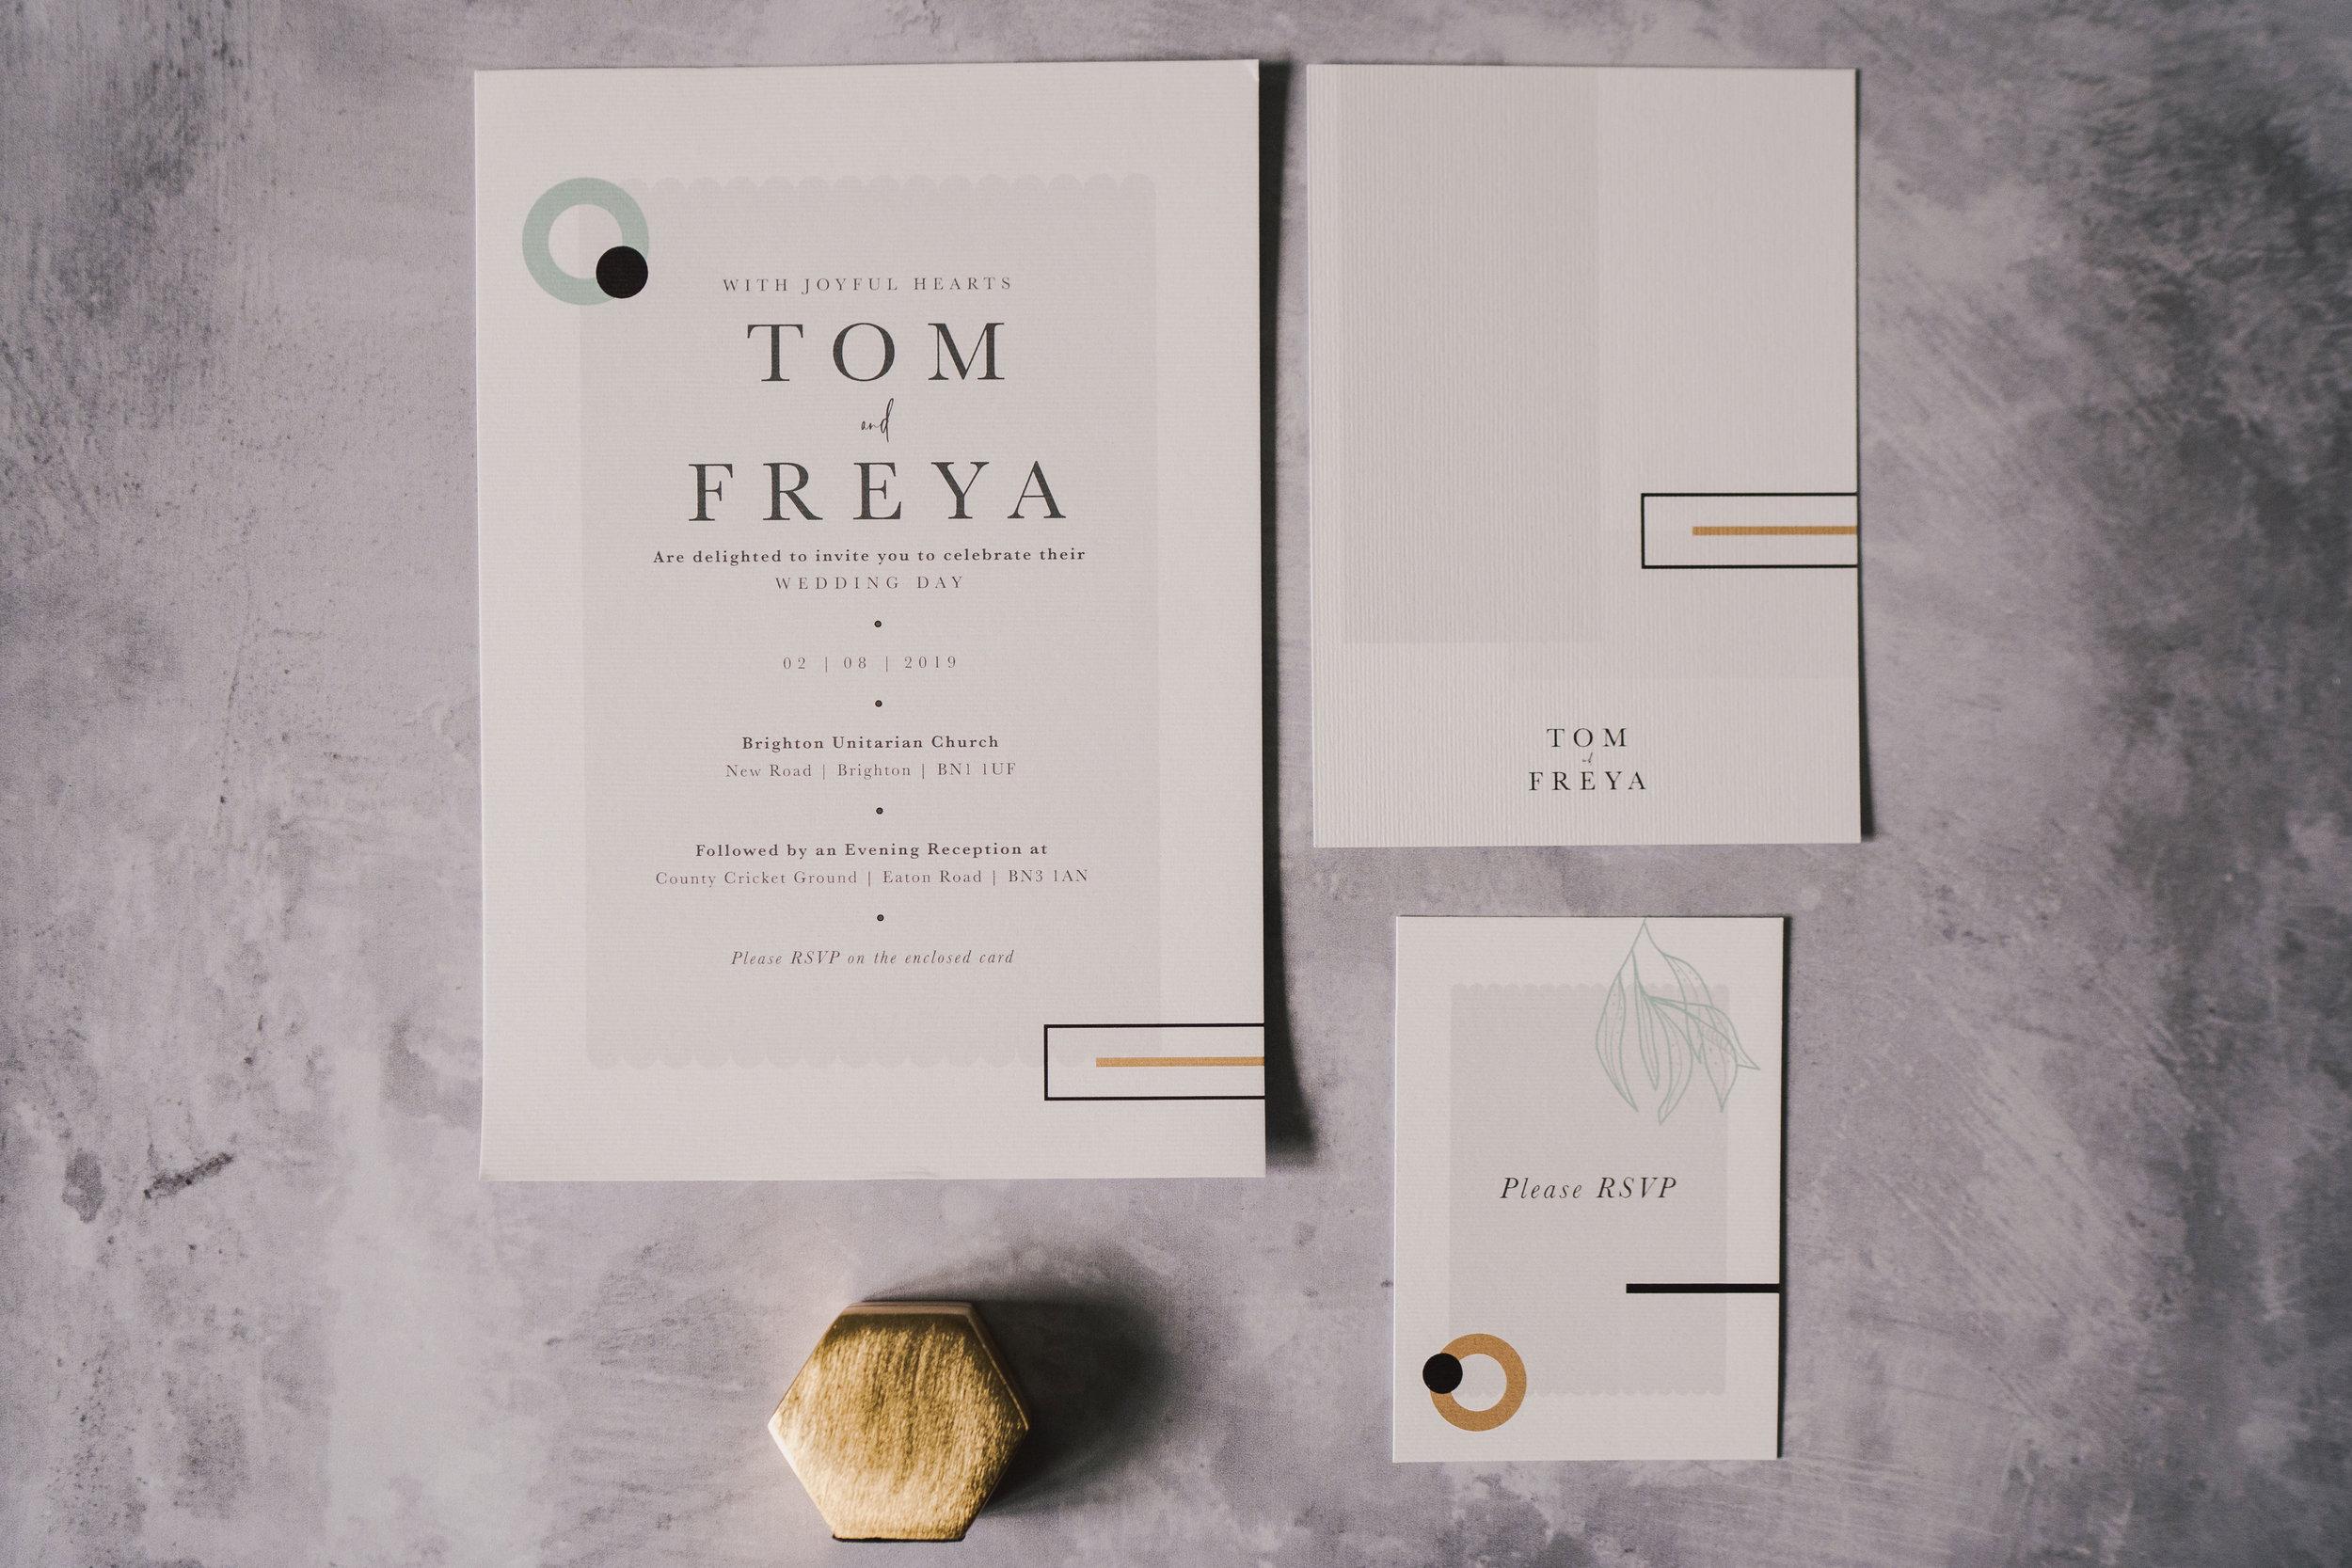 Freya_Wedding_Invitation_Template_8.jpg